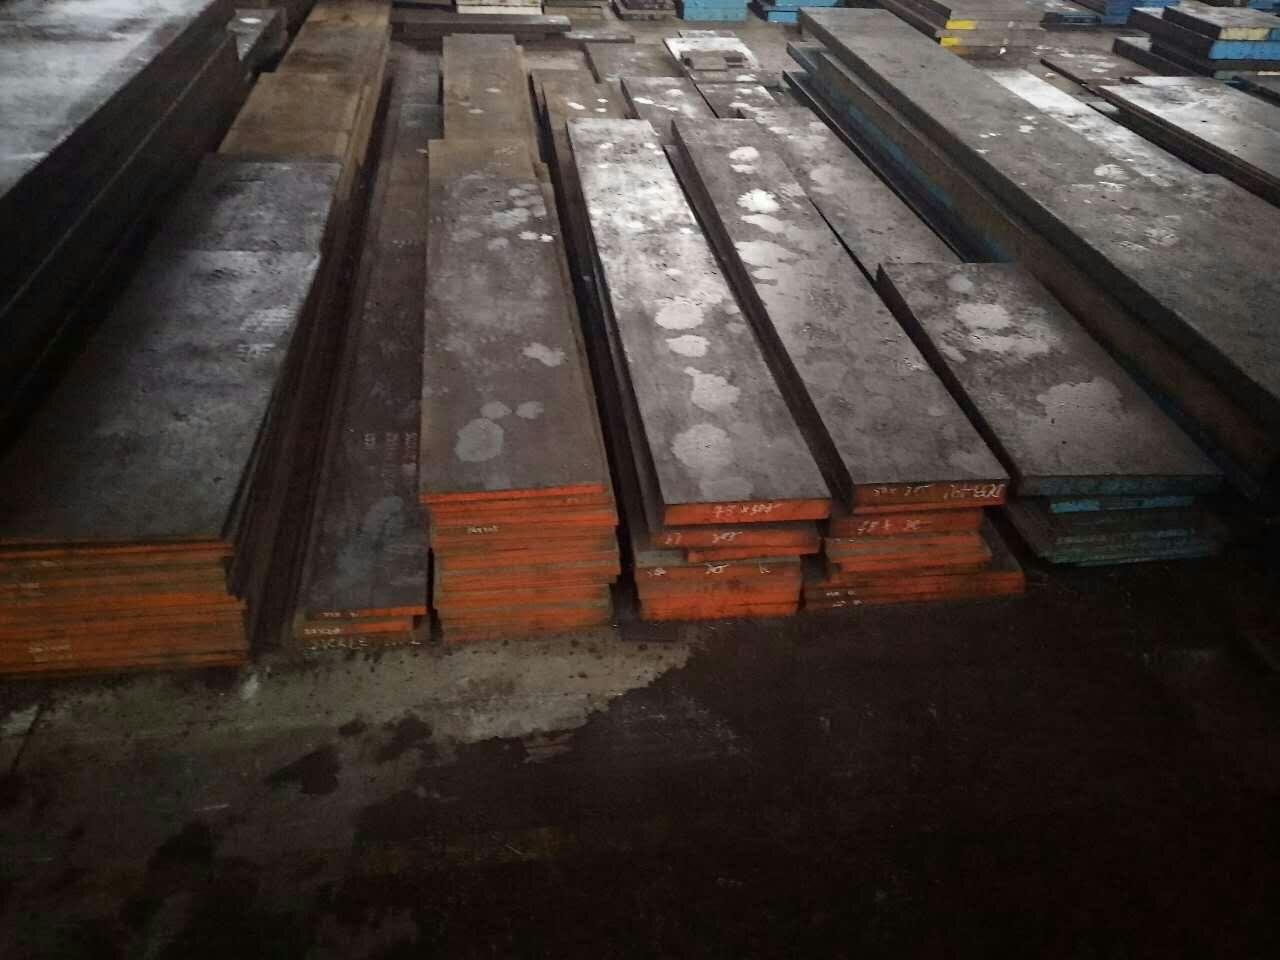 cr8模具钢-cr8模具钢价格厂家,天成模具钢